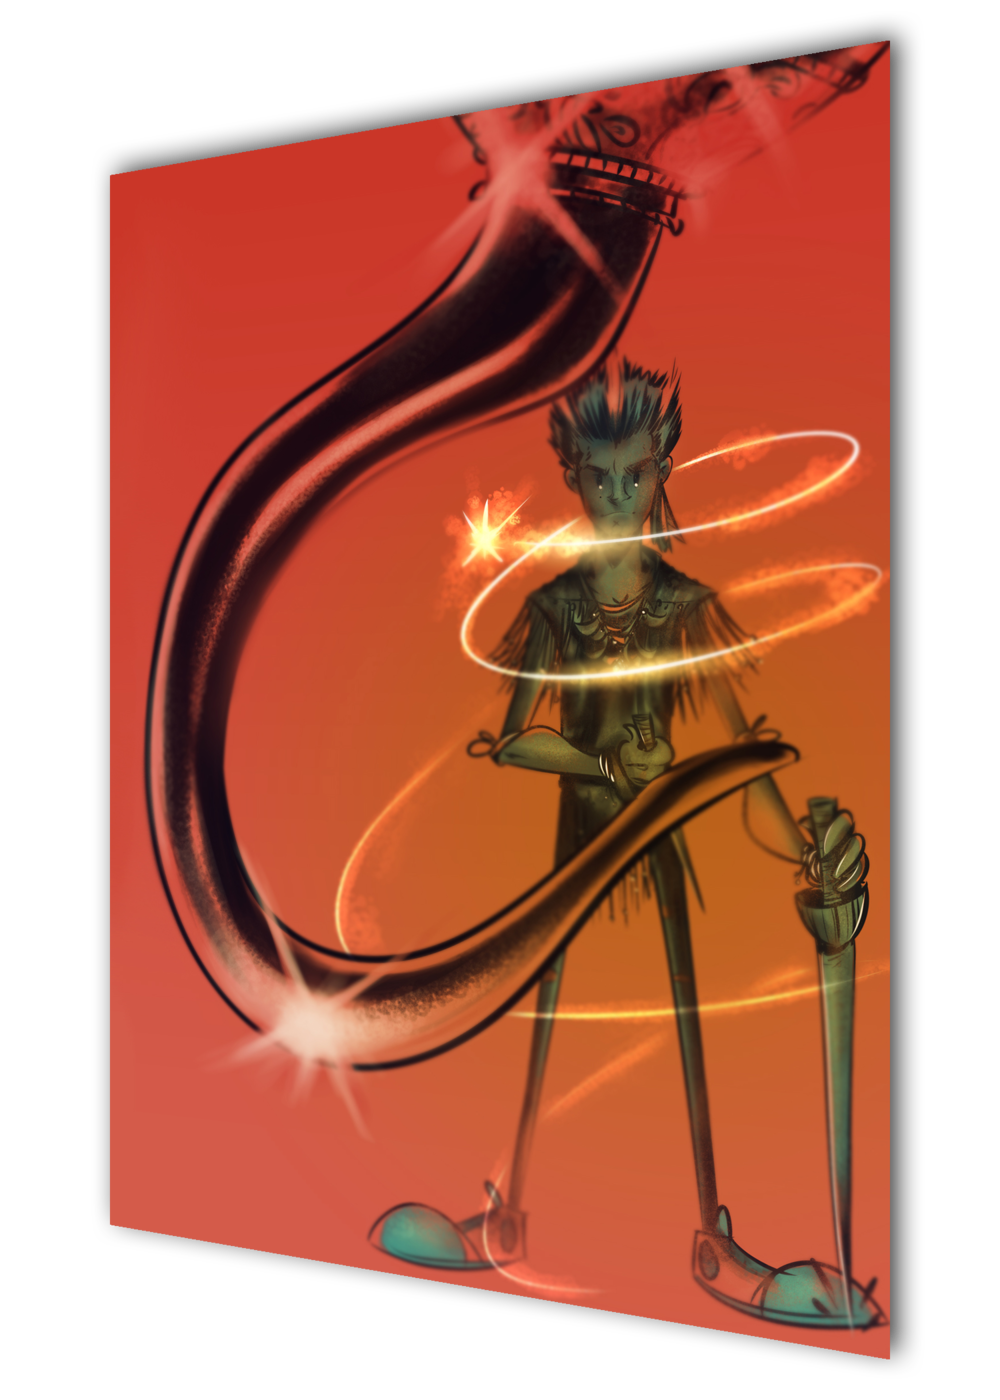 #SE1 - thepannow (super rare)